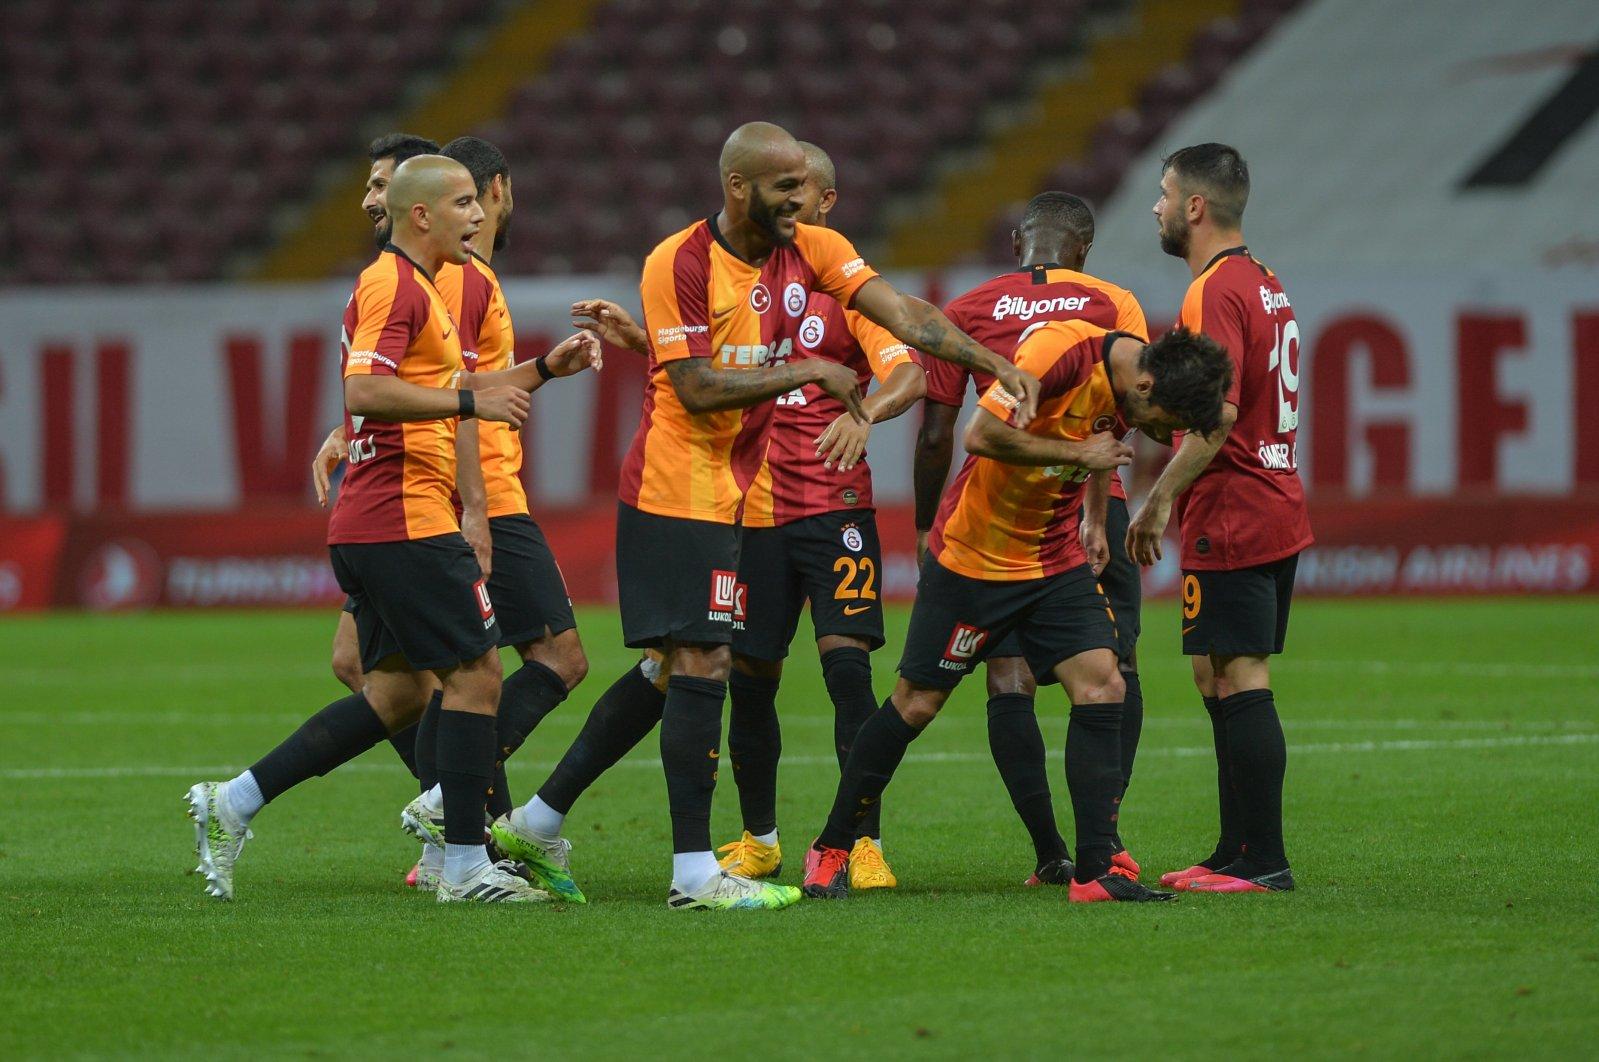 Galatasaray players celebrate a goal during a Süper Lig match in Izmir, Turkey, July 18, 2020. (DHA Photo)